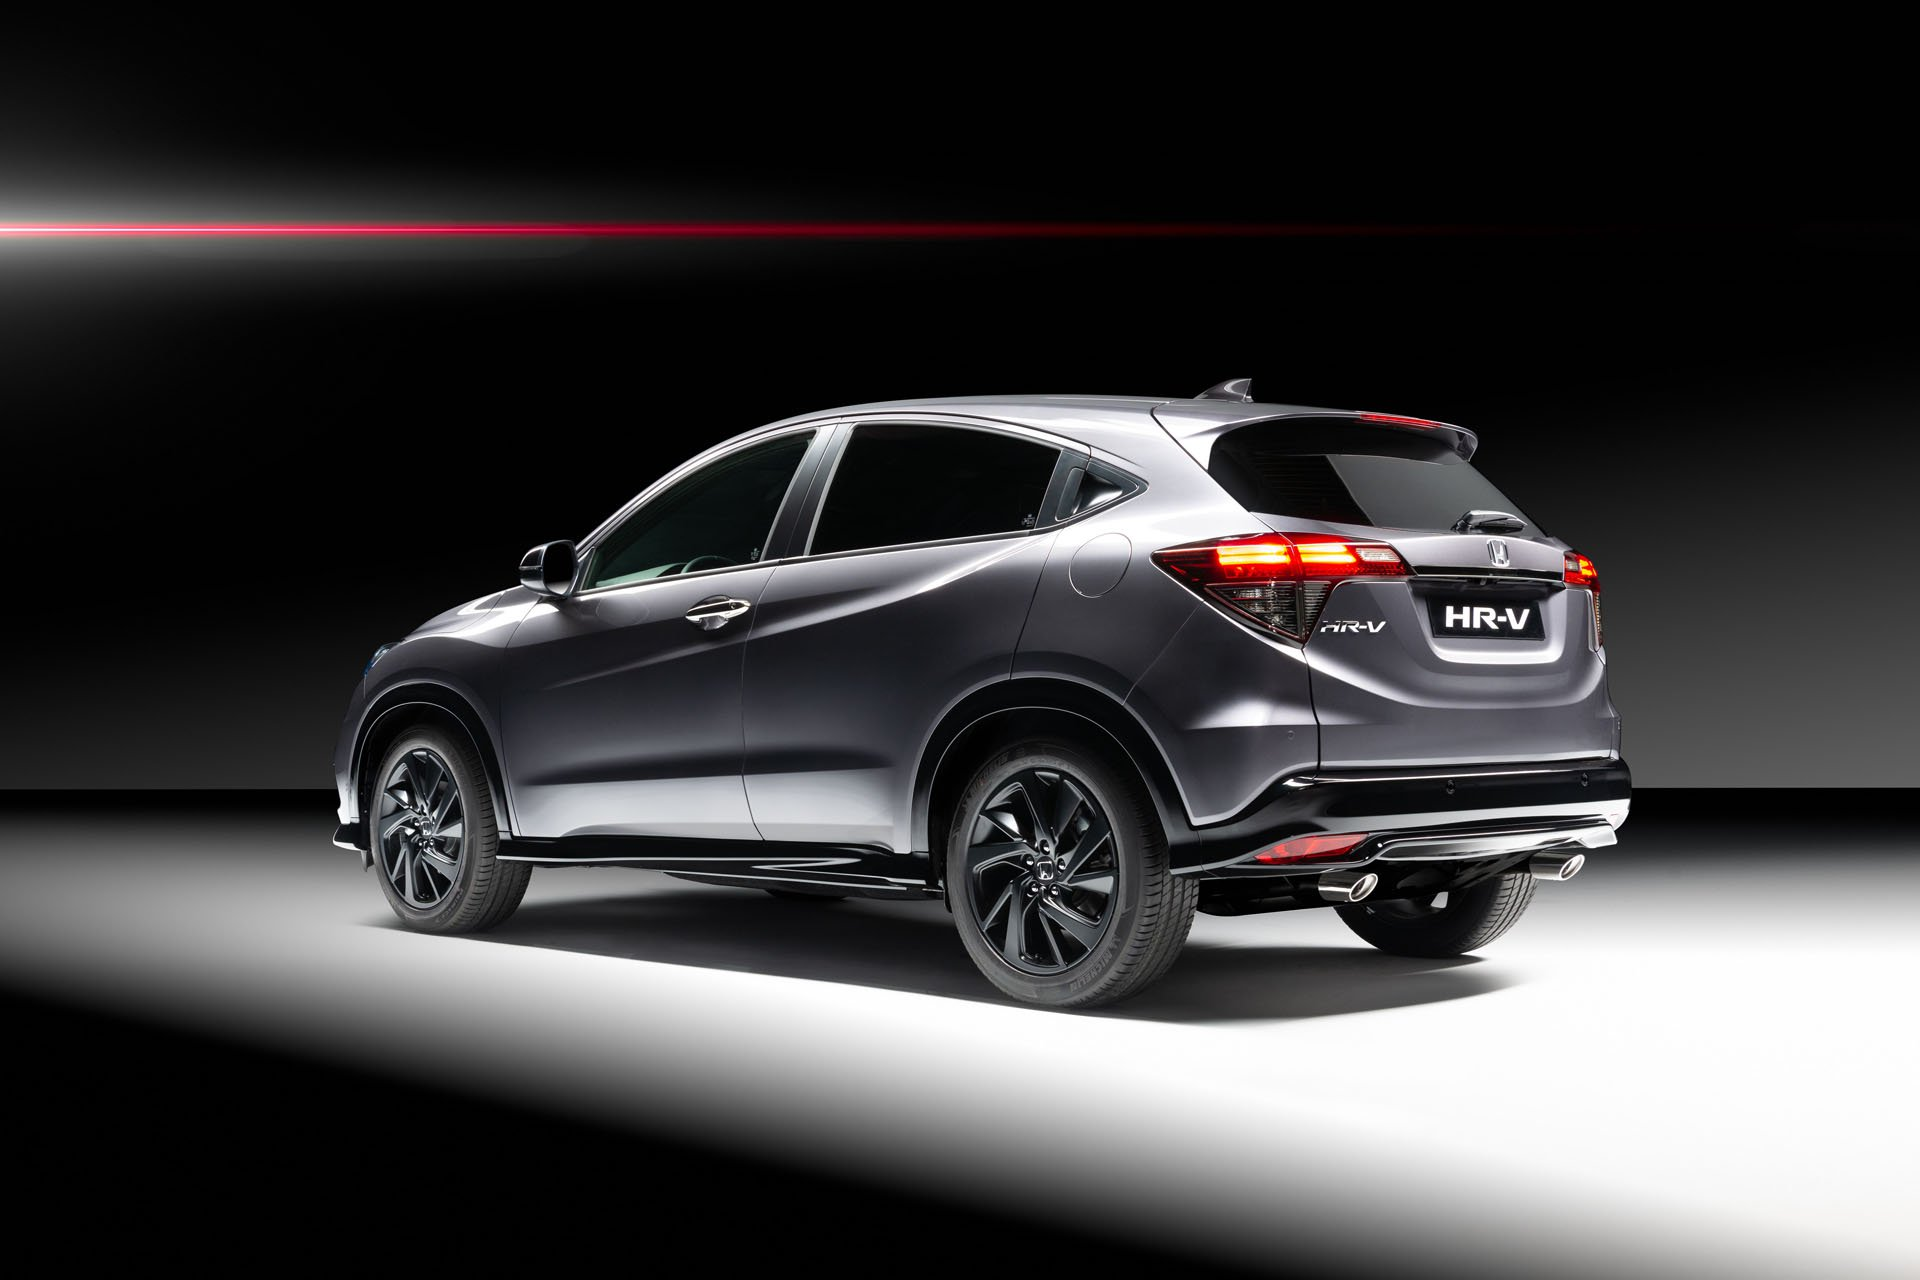 Honda Type R For Sale >> Honda HR-V Sport Gets 1.5L VTEC Turbo Engine With 182 HP ...